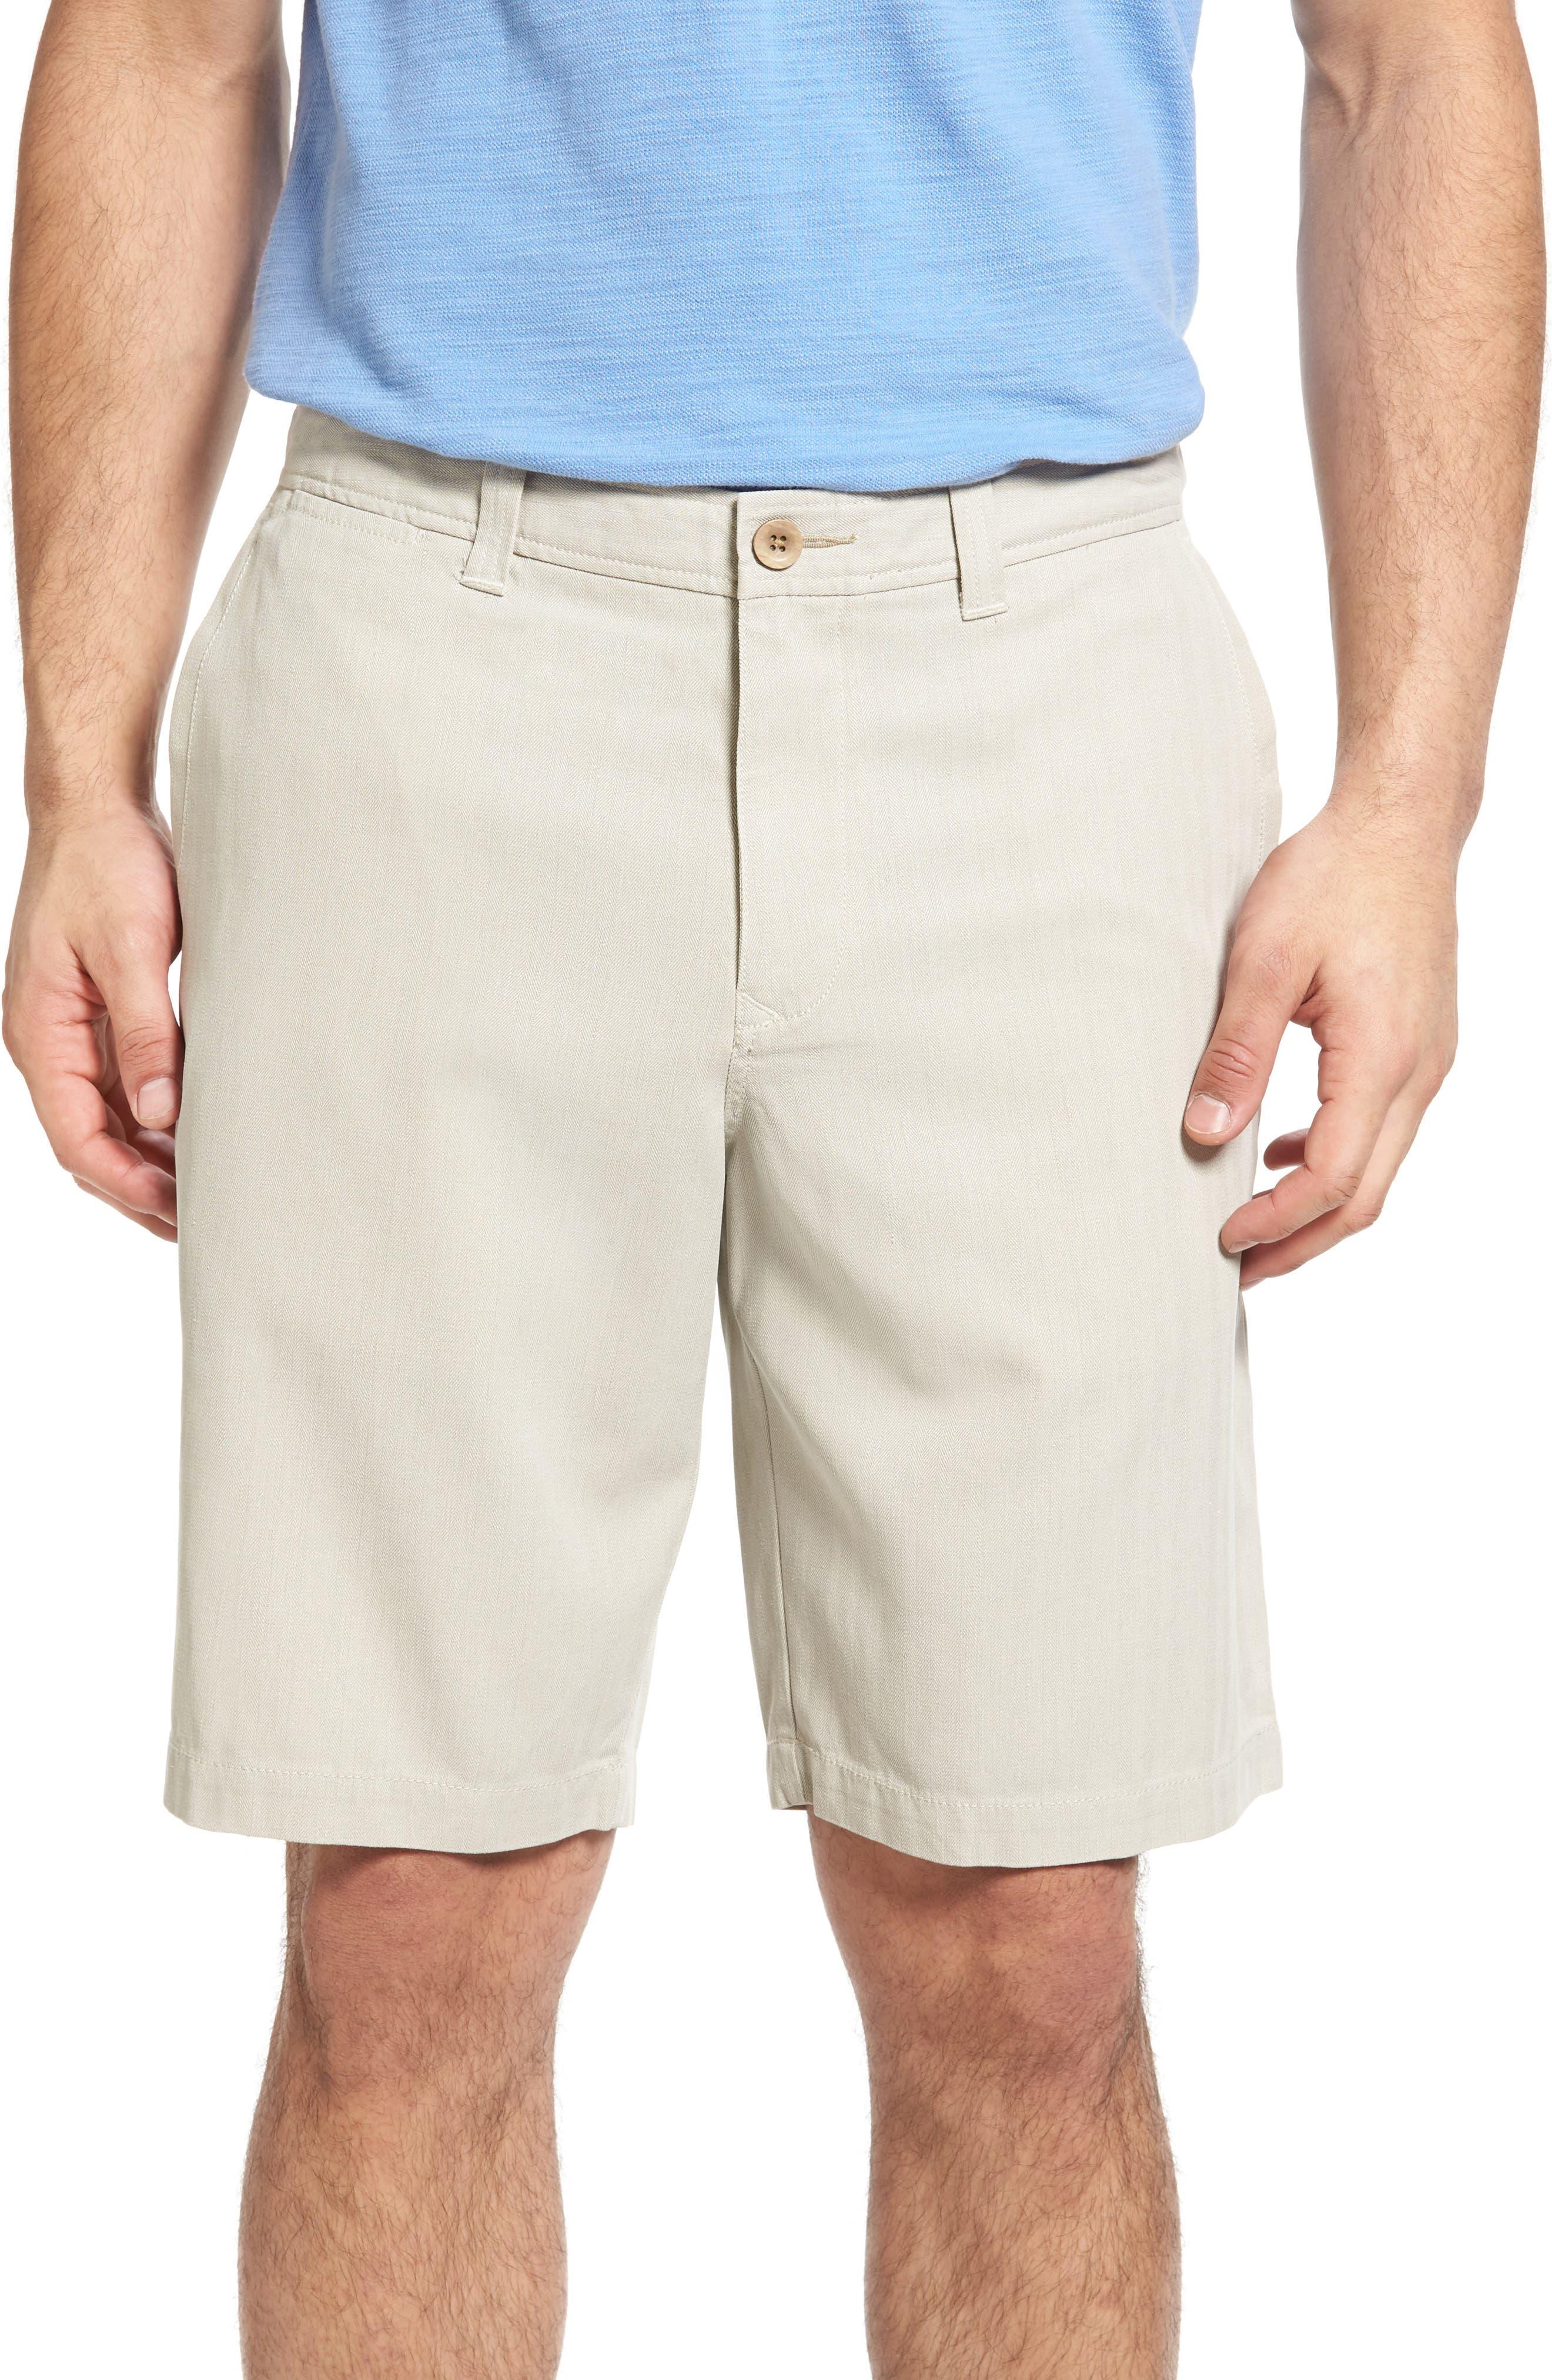 Havana Herringbone Silk Blend Chino Shorts,                             Main thumbnail 1, color,                             200